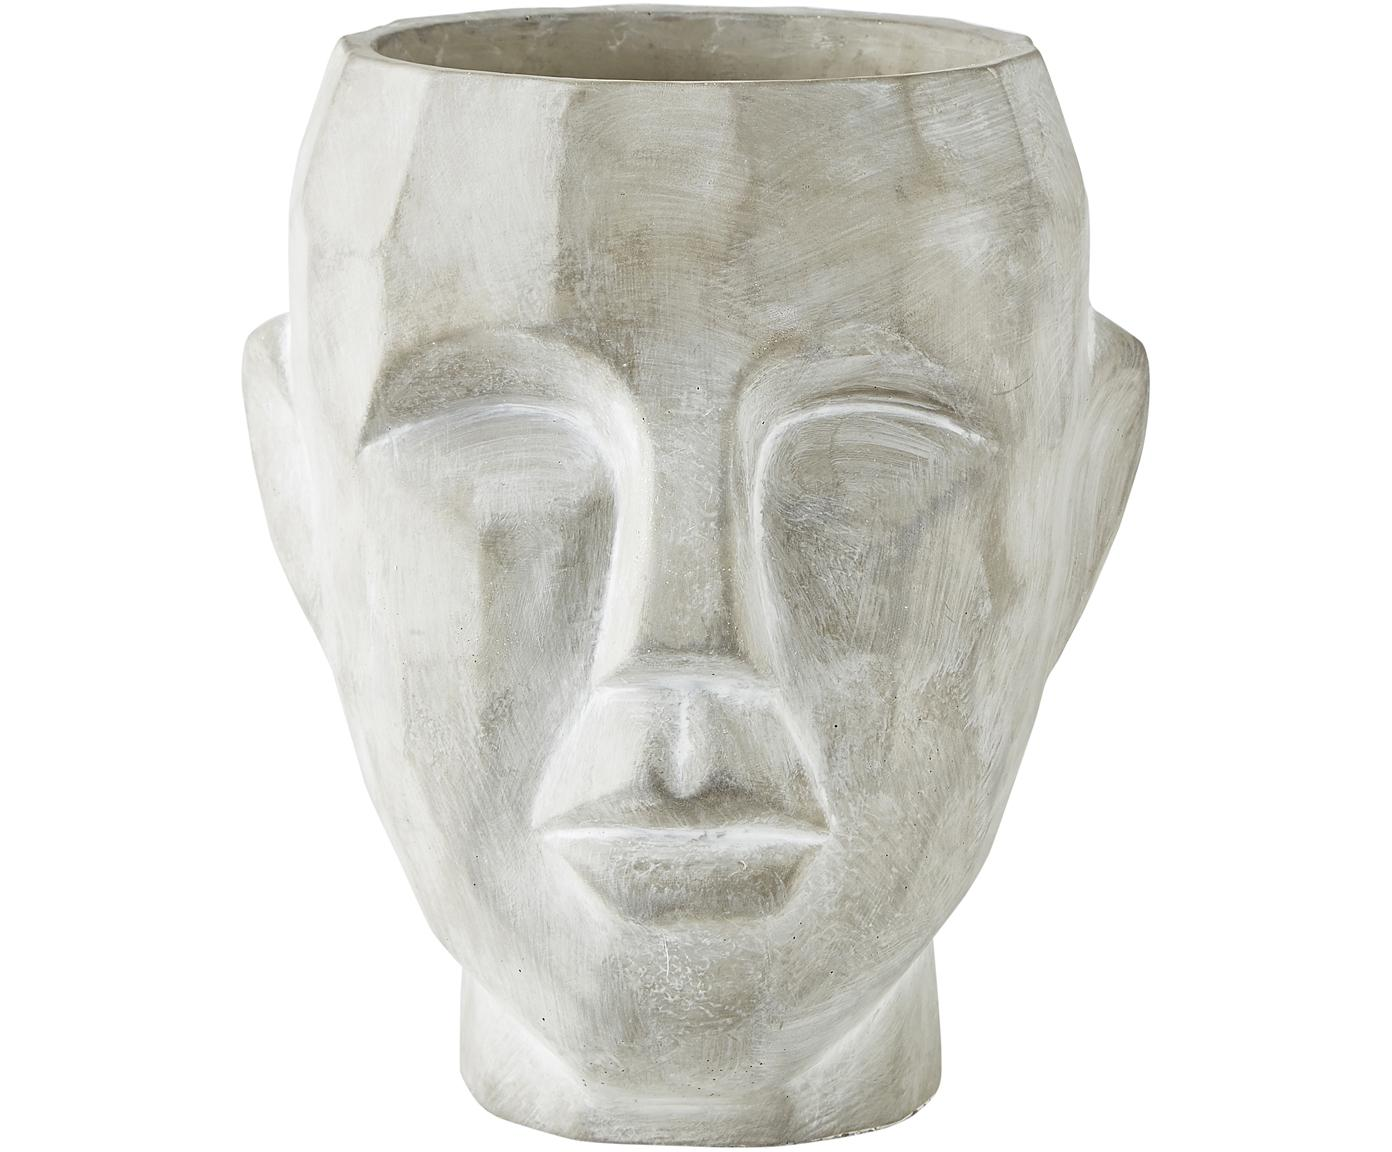 Portavaso in cemento Smile, Cemento, Grigio, Ø 19 x Alt. 22 cm